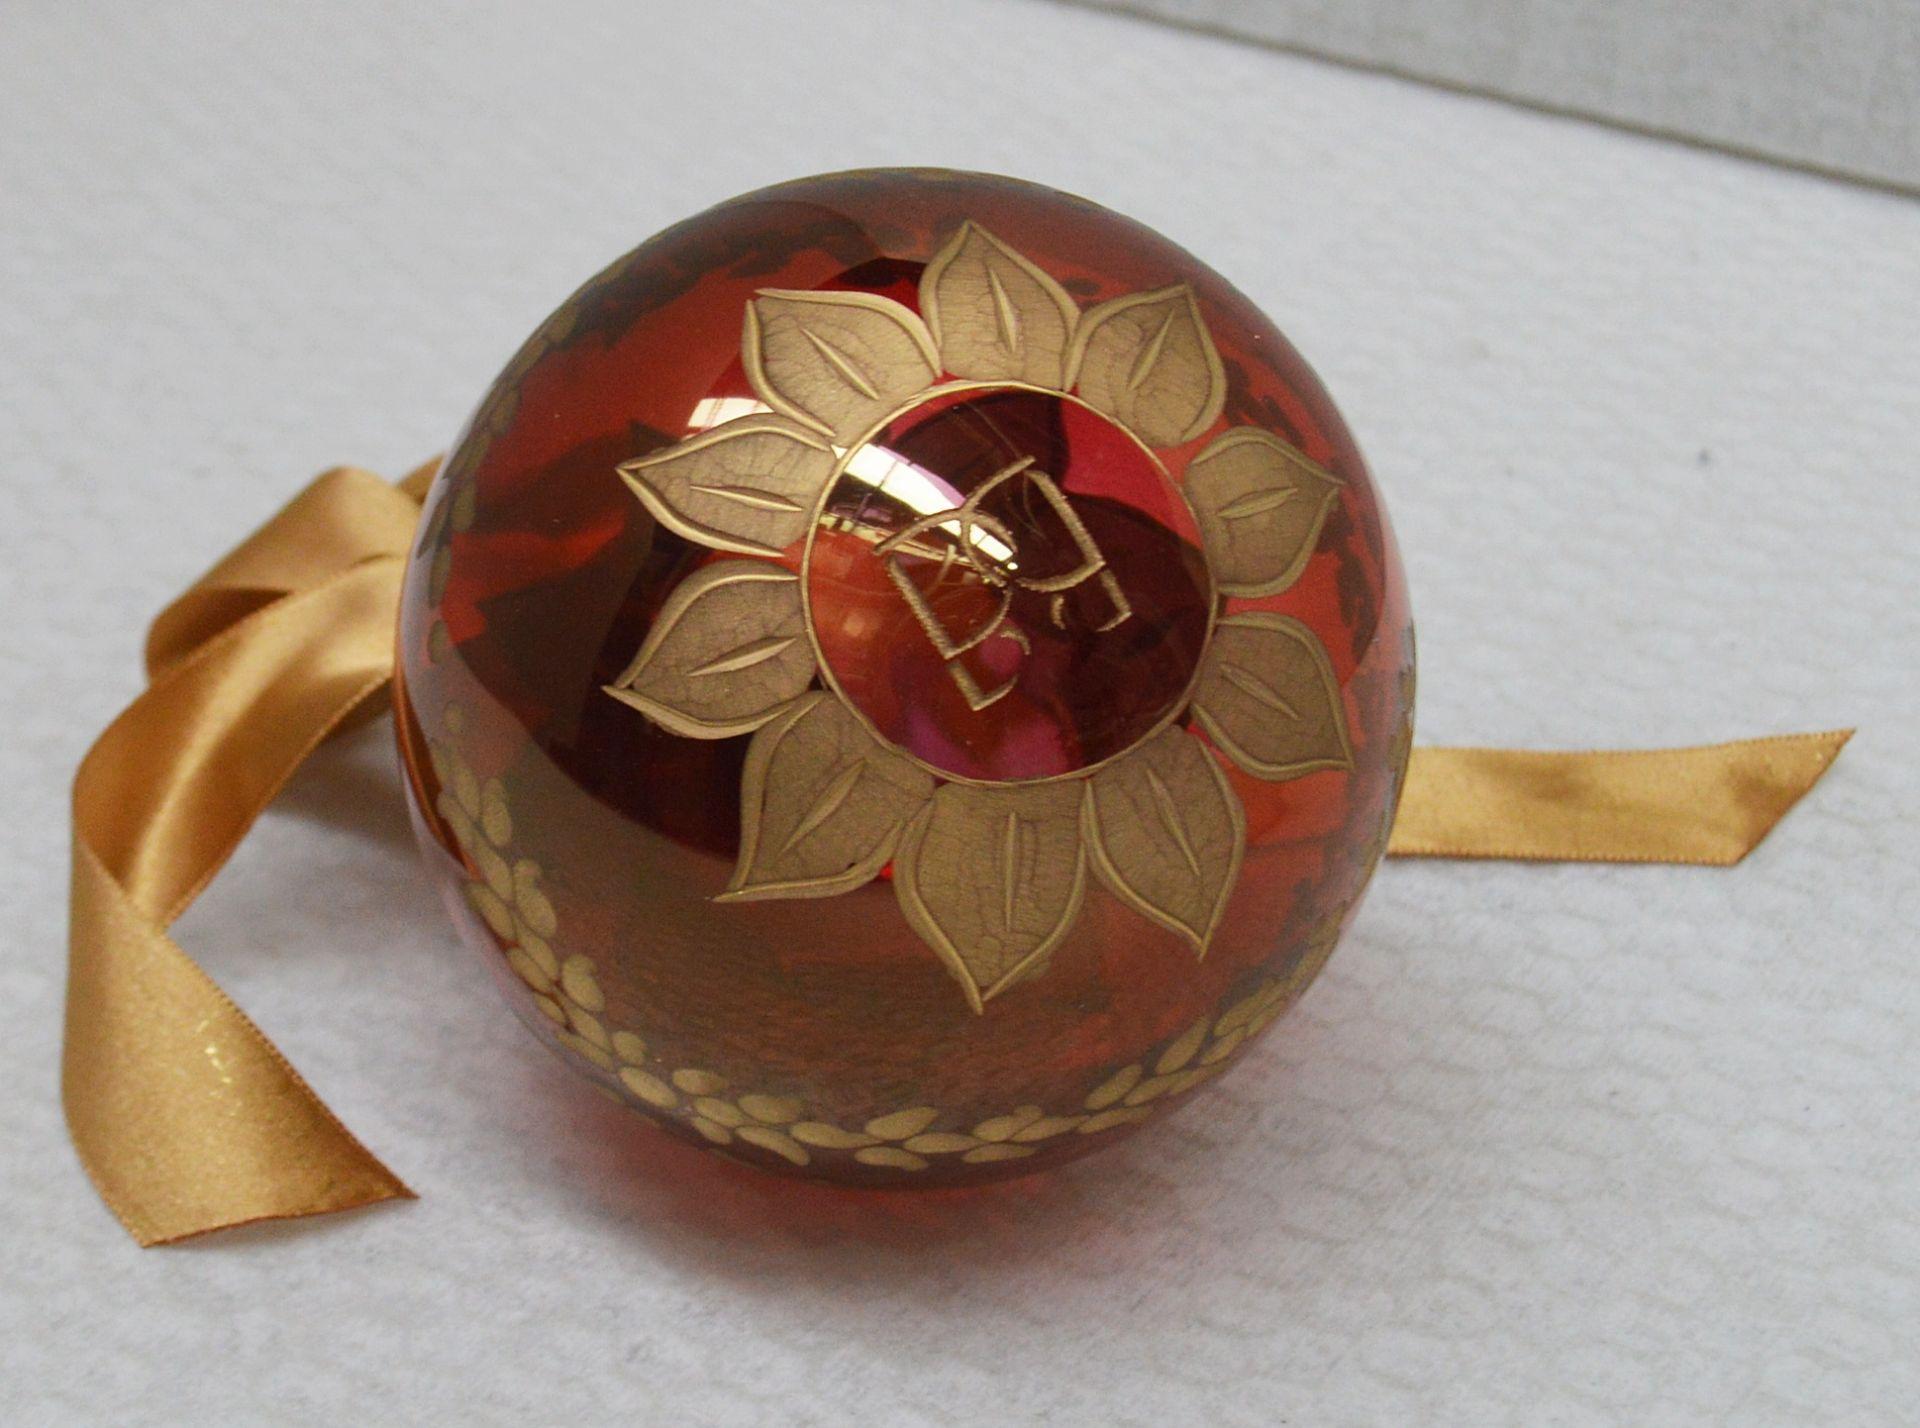 1 x BALDI 'Home Jewels' Italian Hand-crafted Artisan Christmas Tree Decoration Original RRP £114.00 - Image 3 of 5